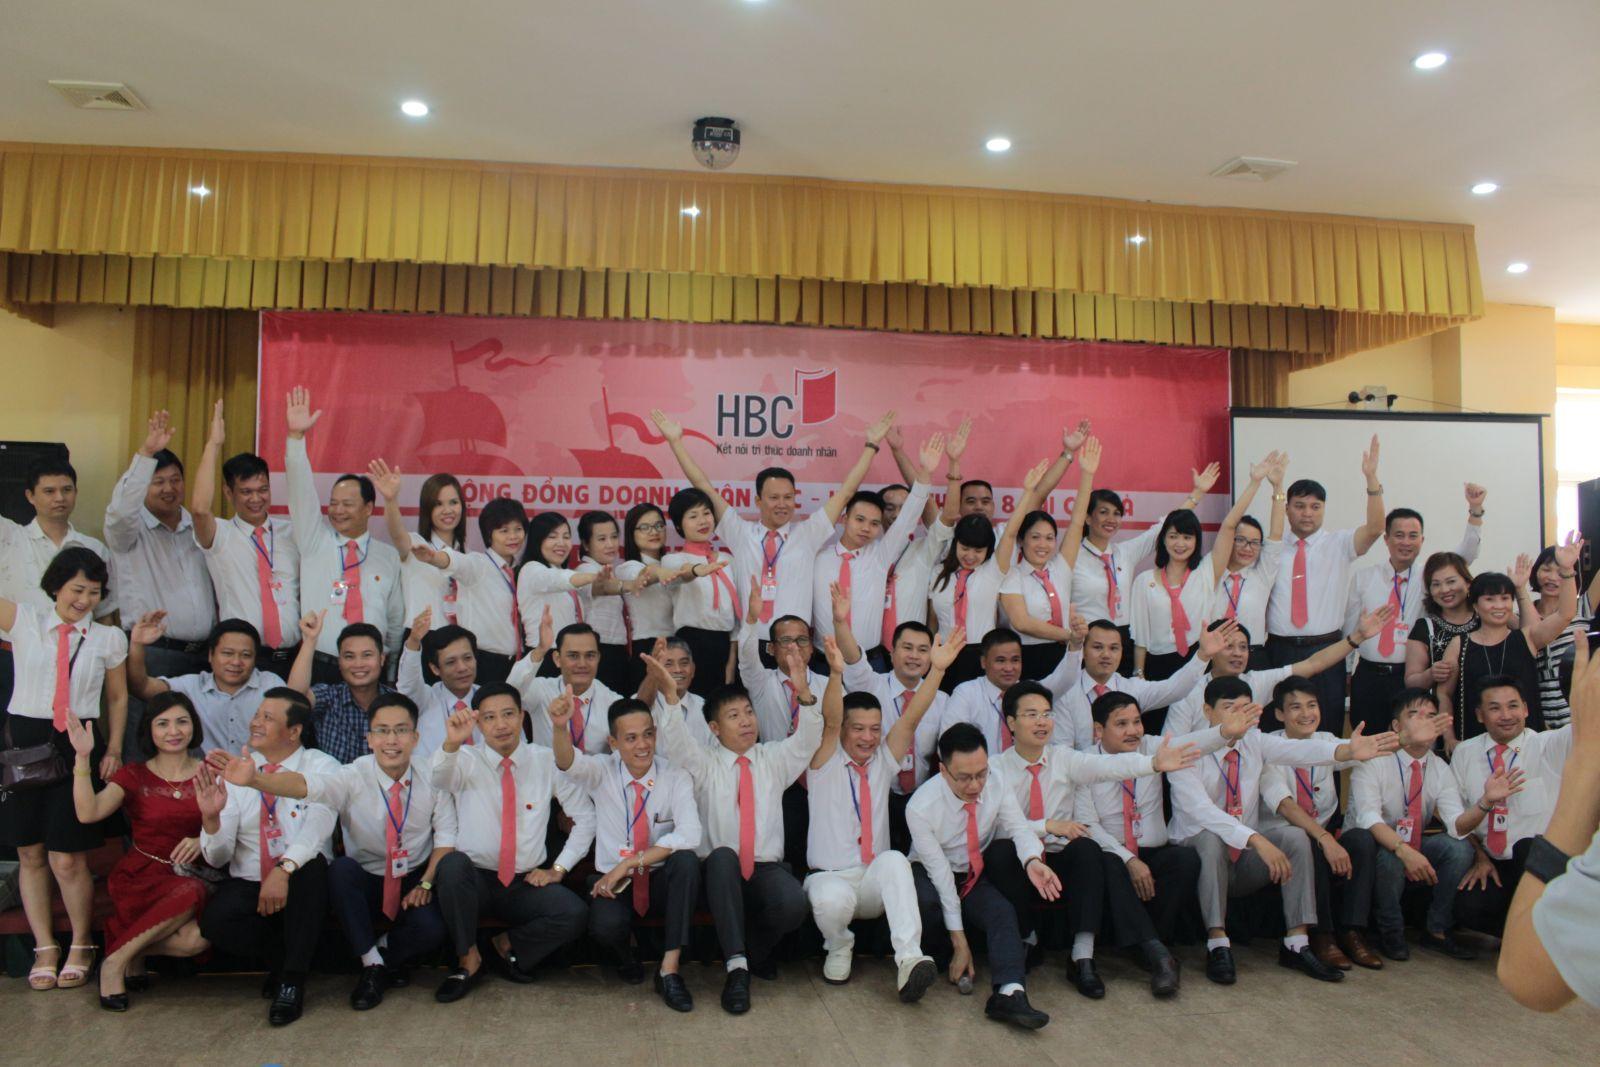 Cong-dong-doanh-nhan-HBC-–-Tien-ra-bien-lon